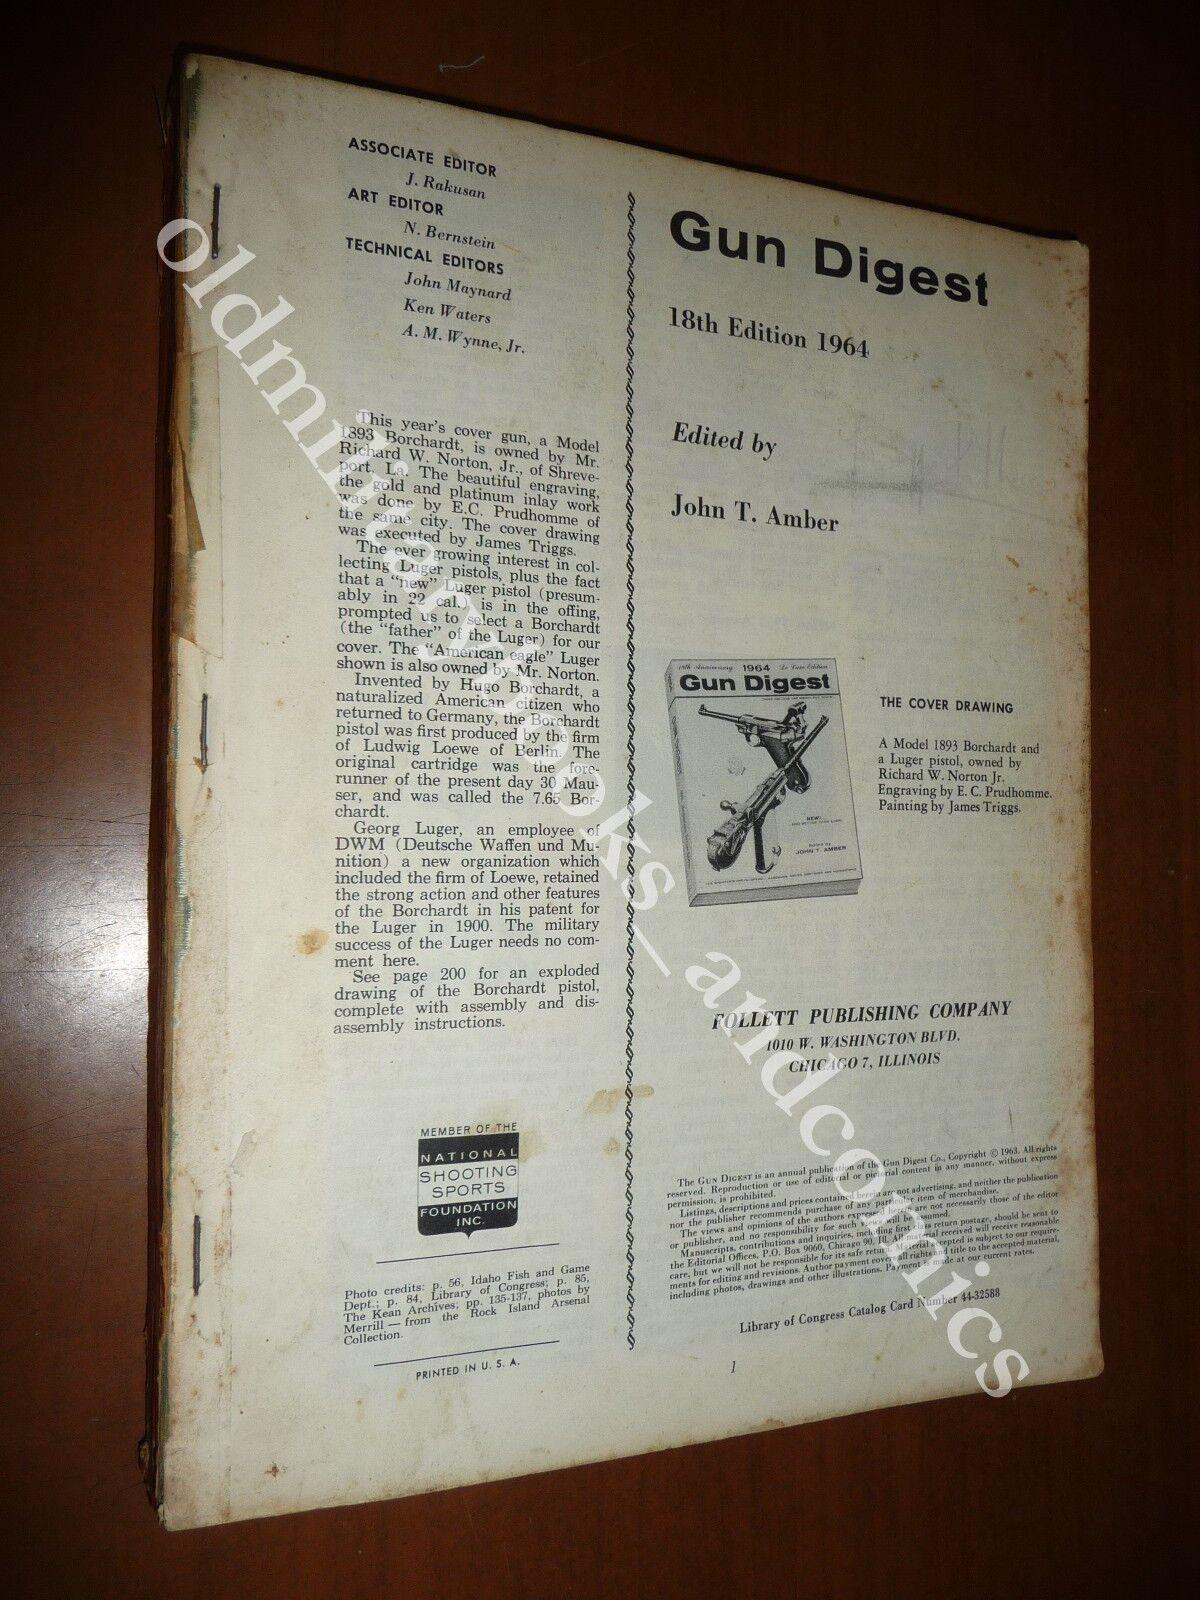 GUN DIGEST 1964 WORLD'S GREATEST GUN BOOK JOHN T. AMBER PISTOLE FUCILI REVOLVER